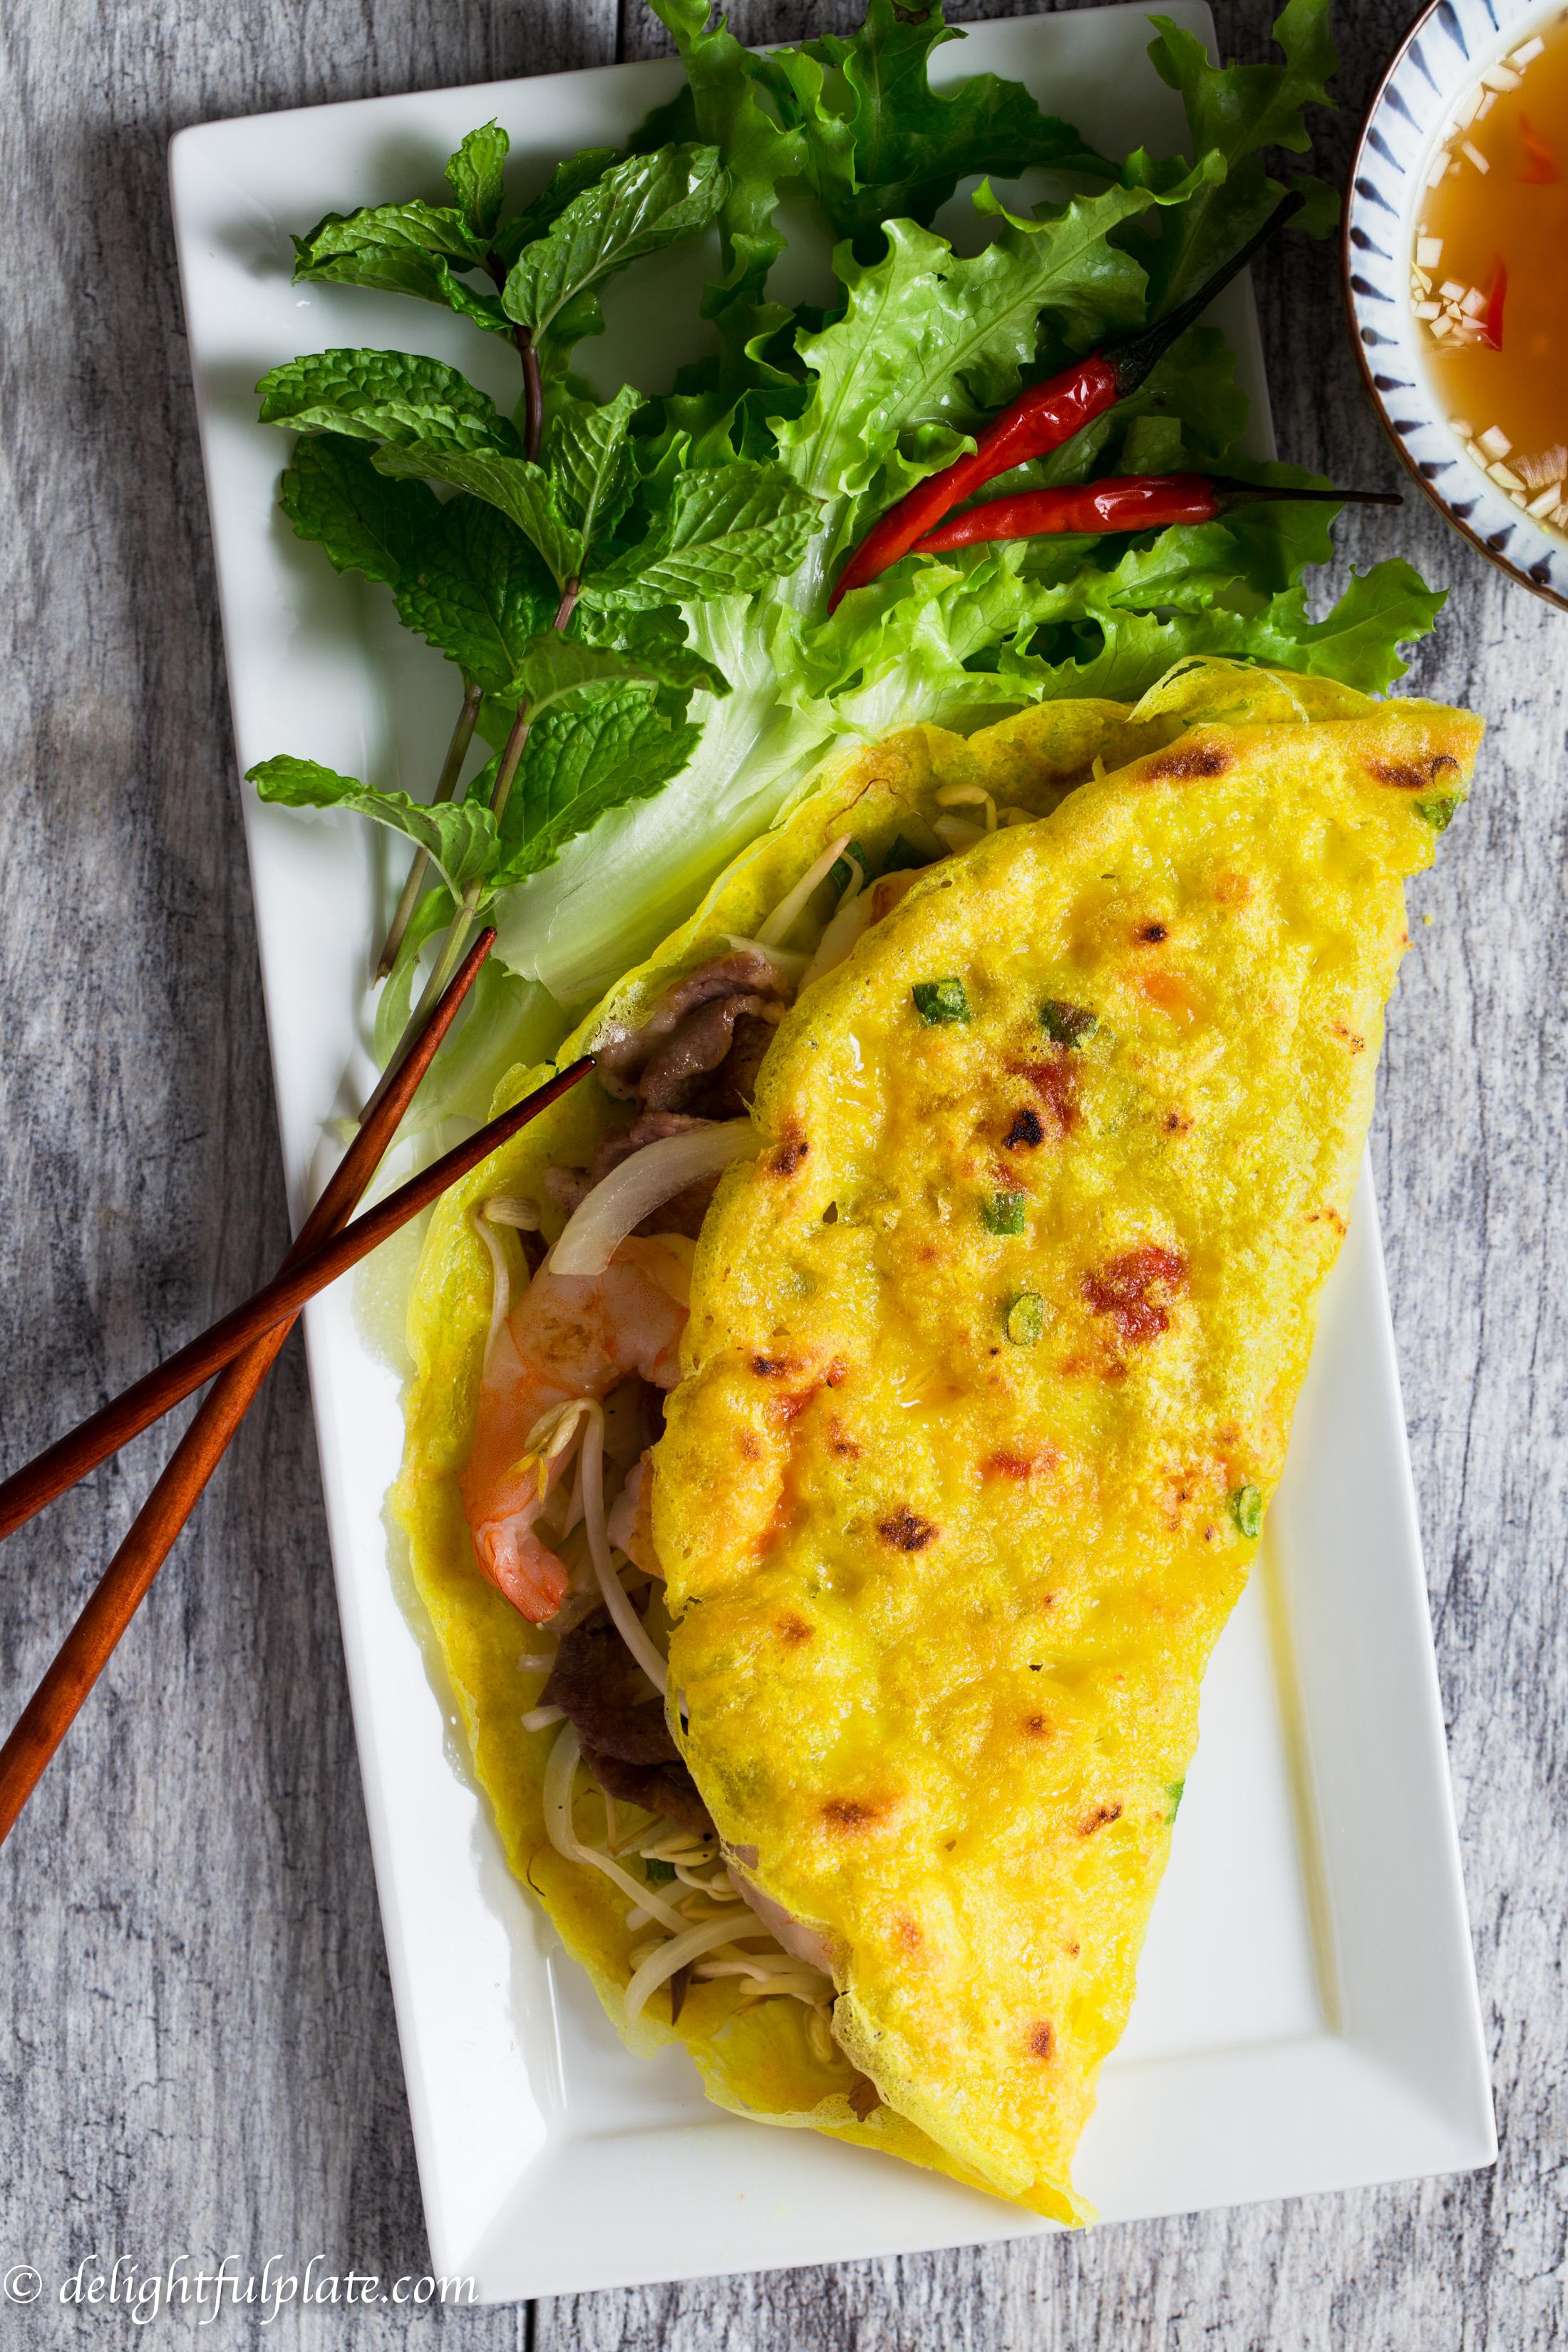 Crispy Vietnamese Crepe (Banh Xeo) - Delightful Plate